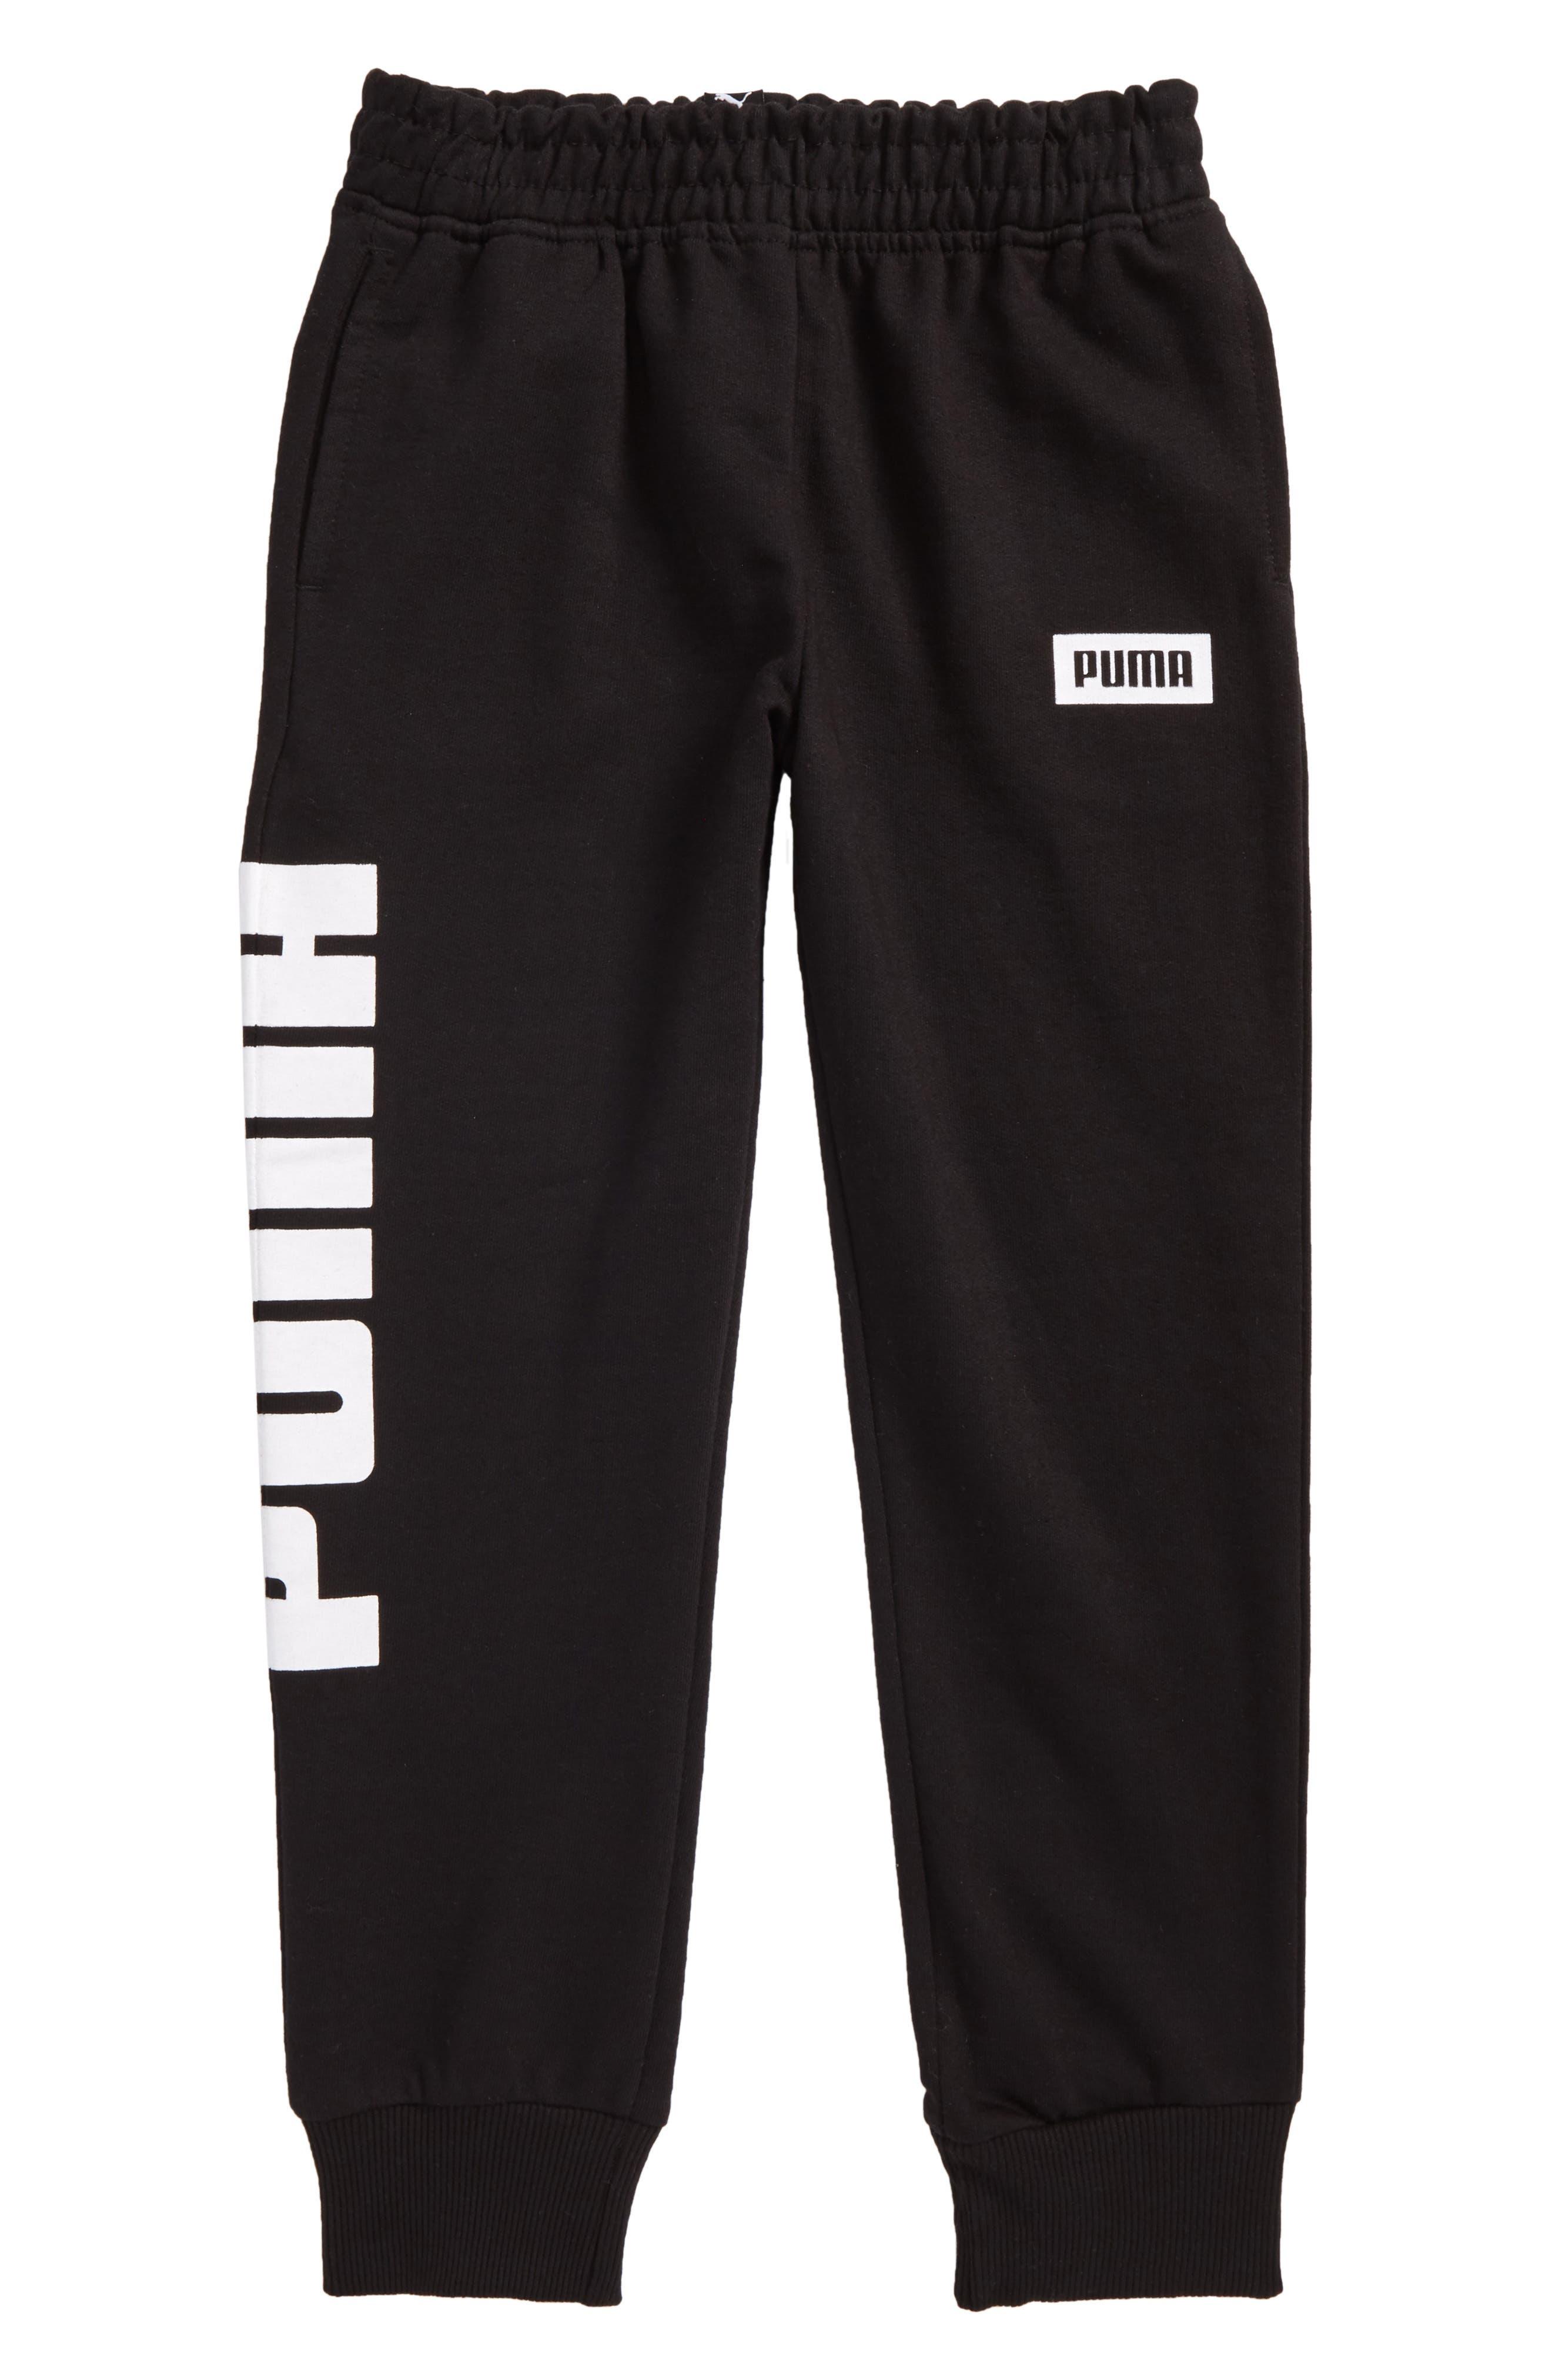 PUMA REbel Track Pants (Little Boys)